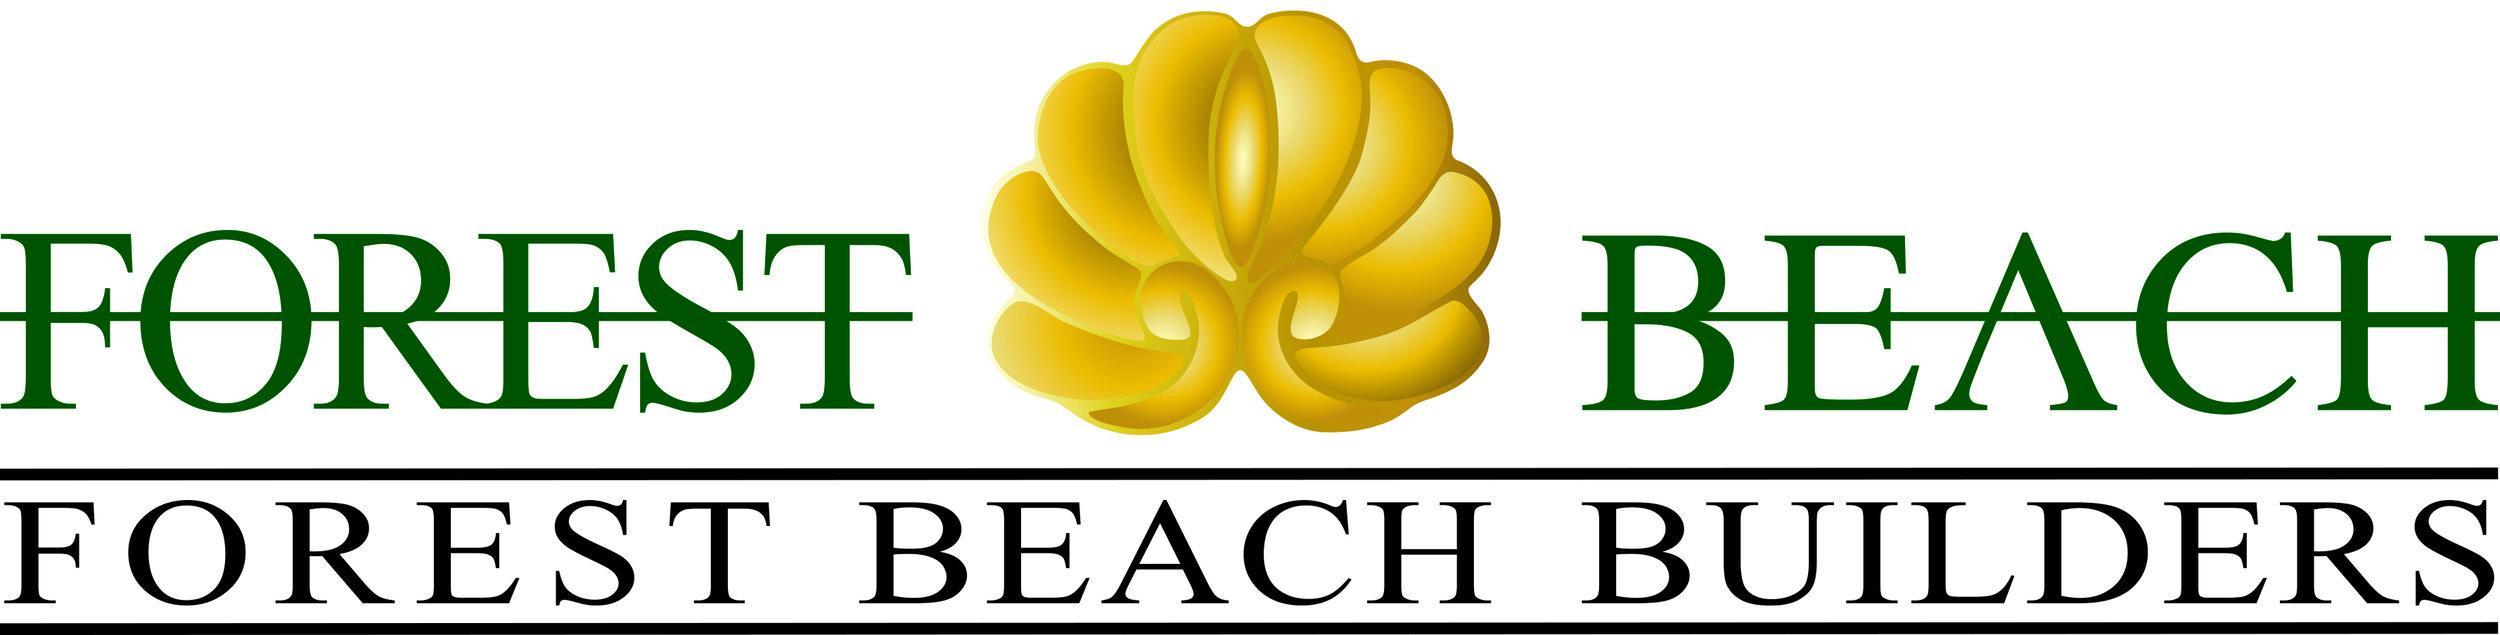 FBB Shell logo6.jpg